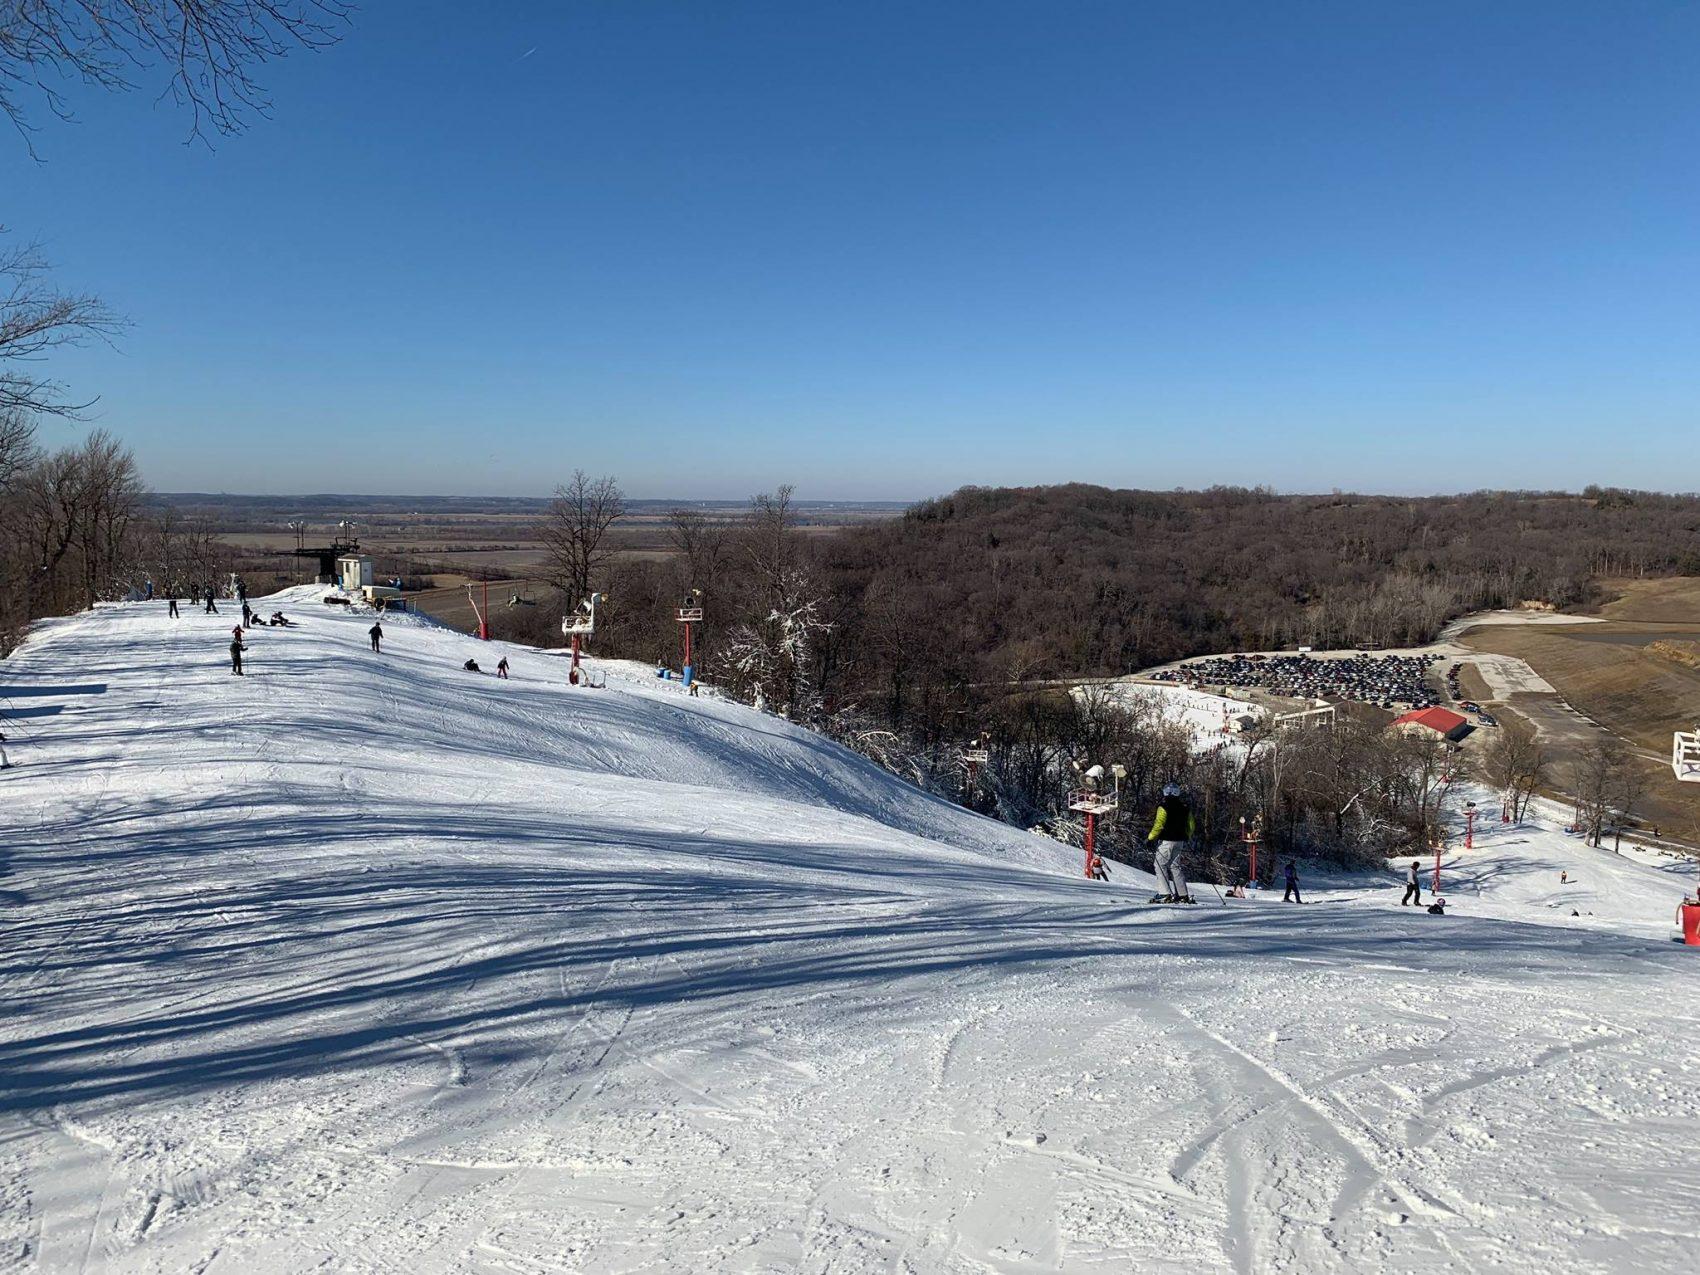 Midwest ski